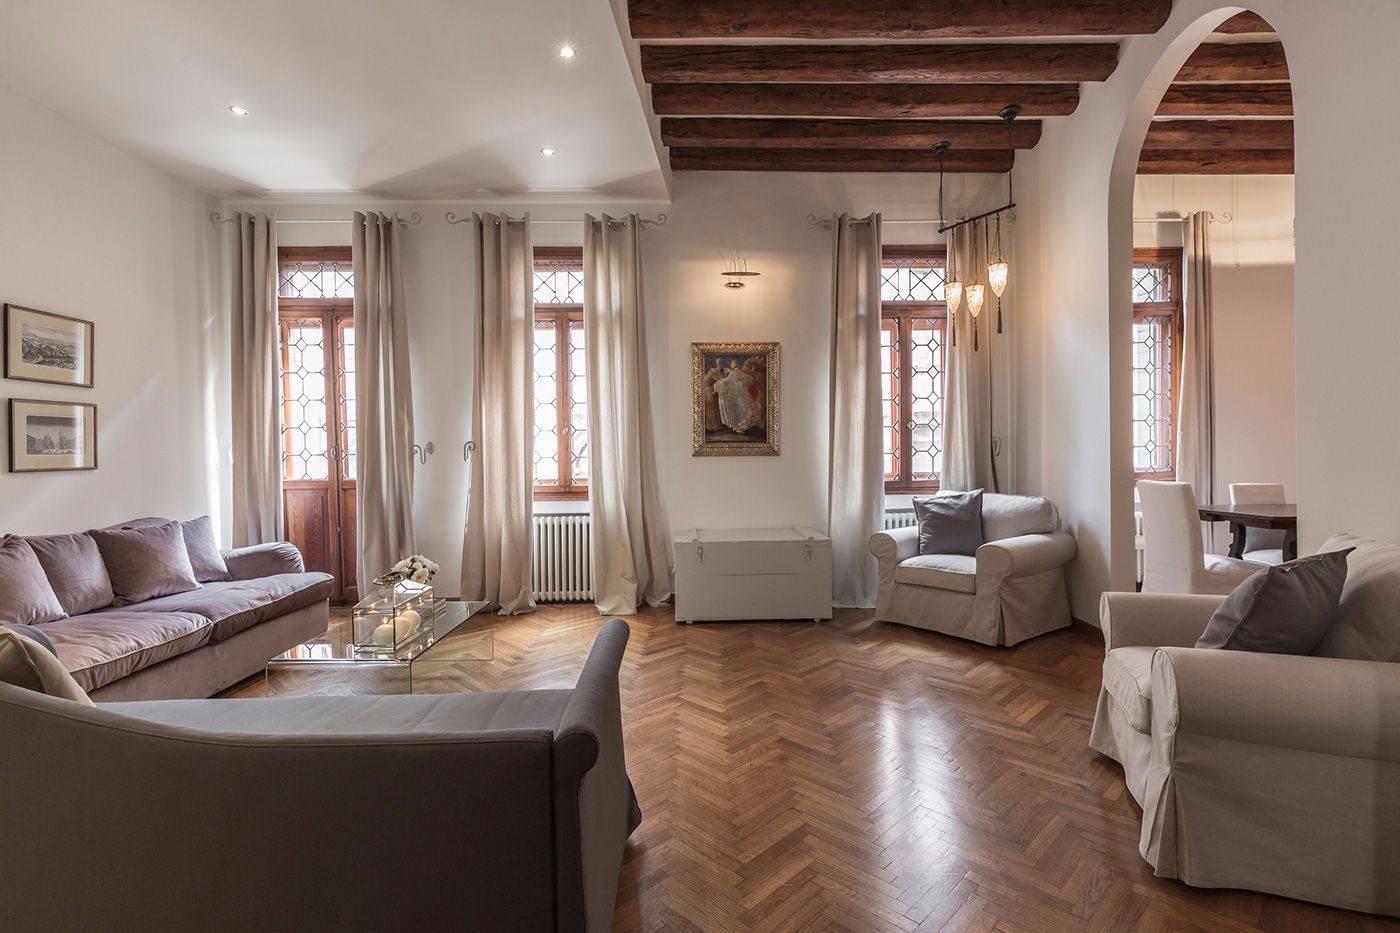 fishbone parquet flooring, antique wooden beams, leaded glass windows...